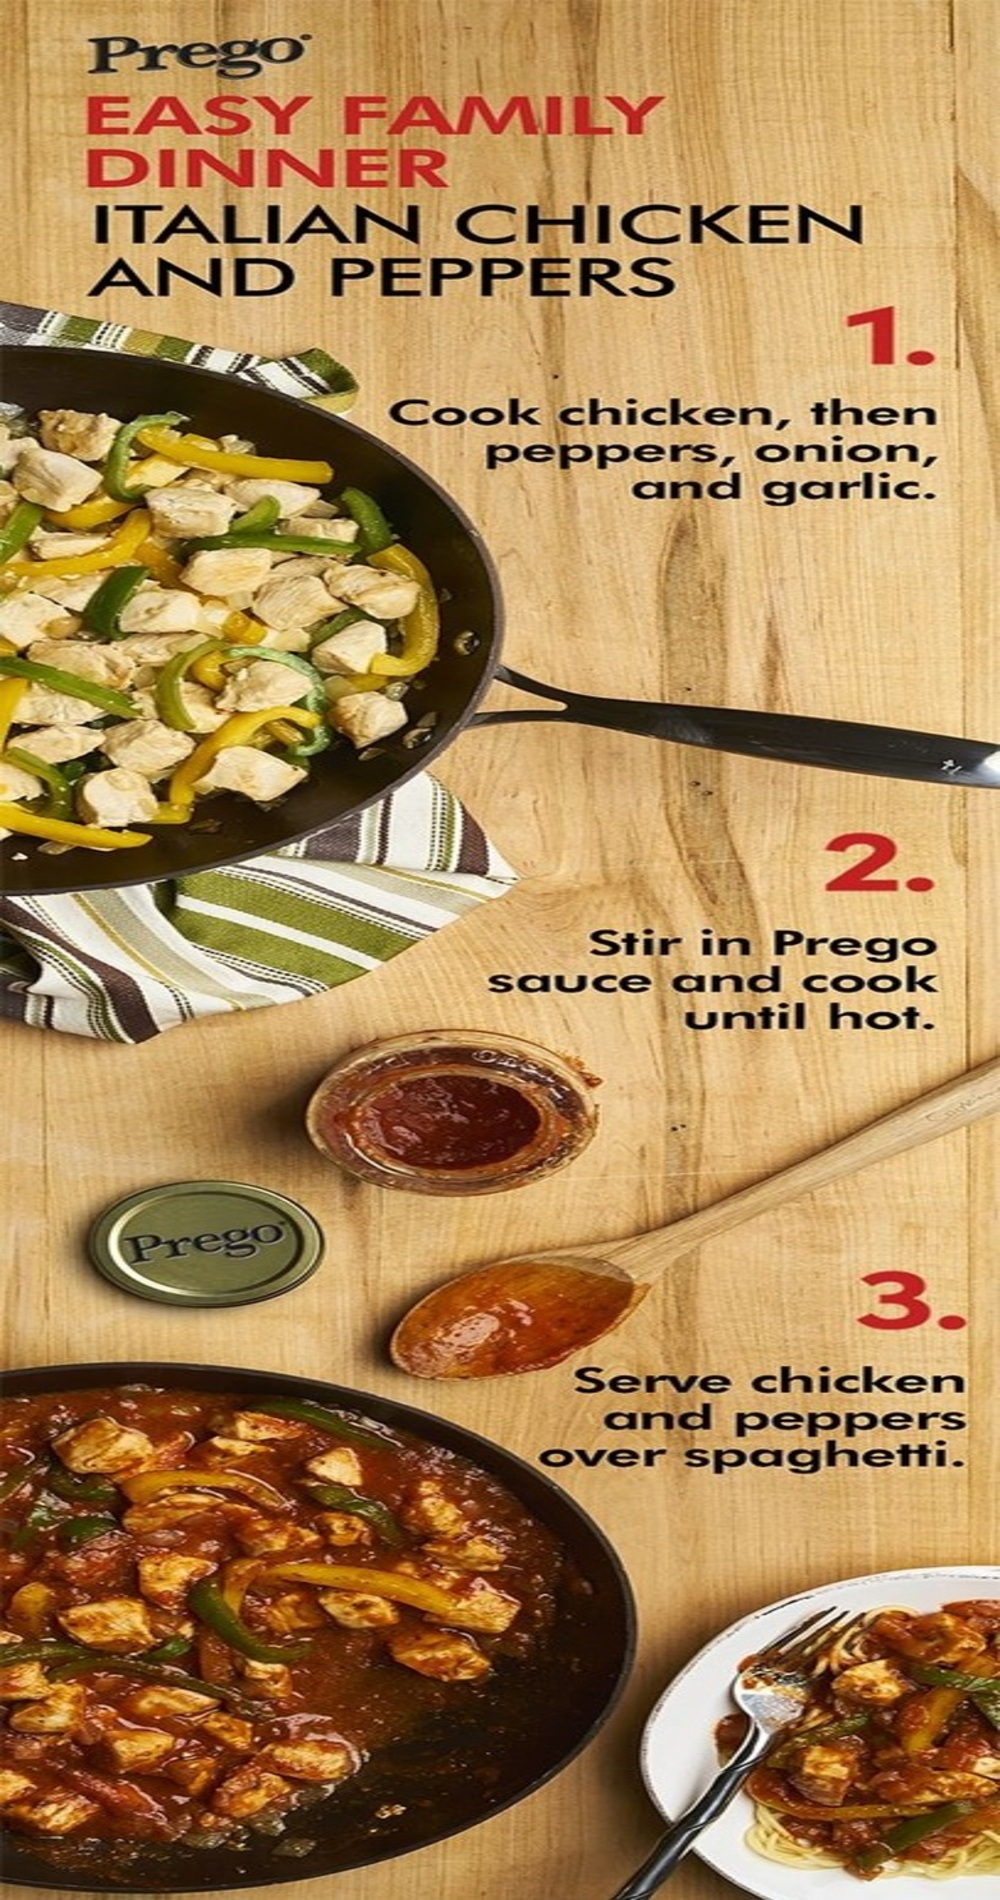 Italian Chicken & Peppers